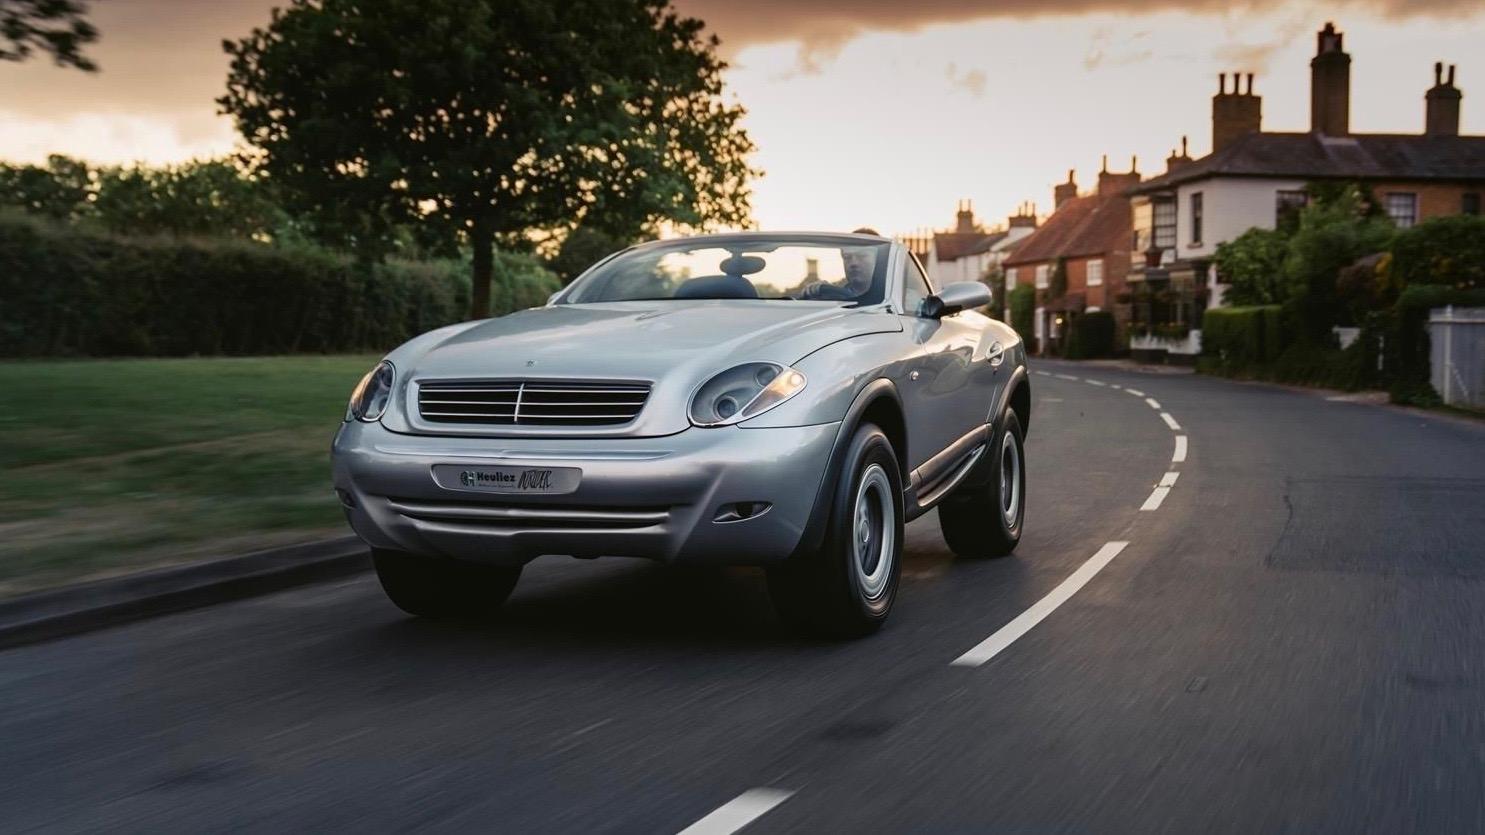 Mercedes G-Wagen Intruder is part G-Class, part SLK, all strange